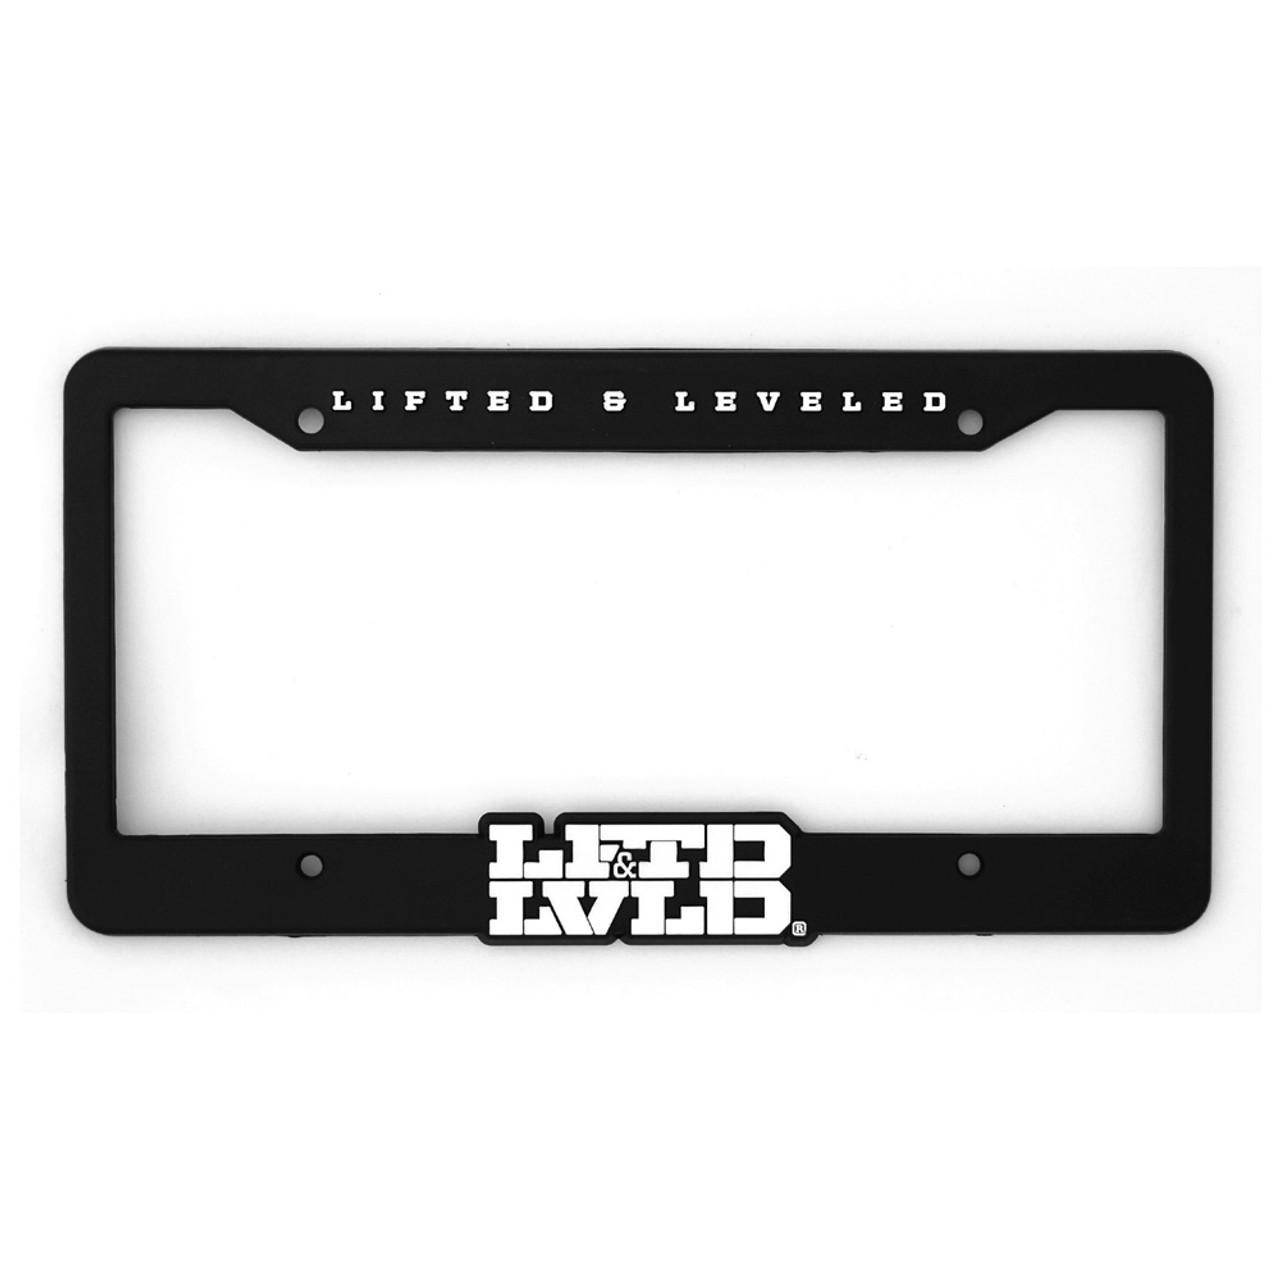 LFTD & LVLD Black License Plate Frame - DUB Shop